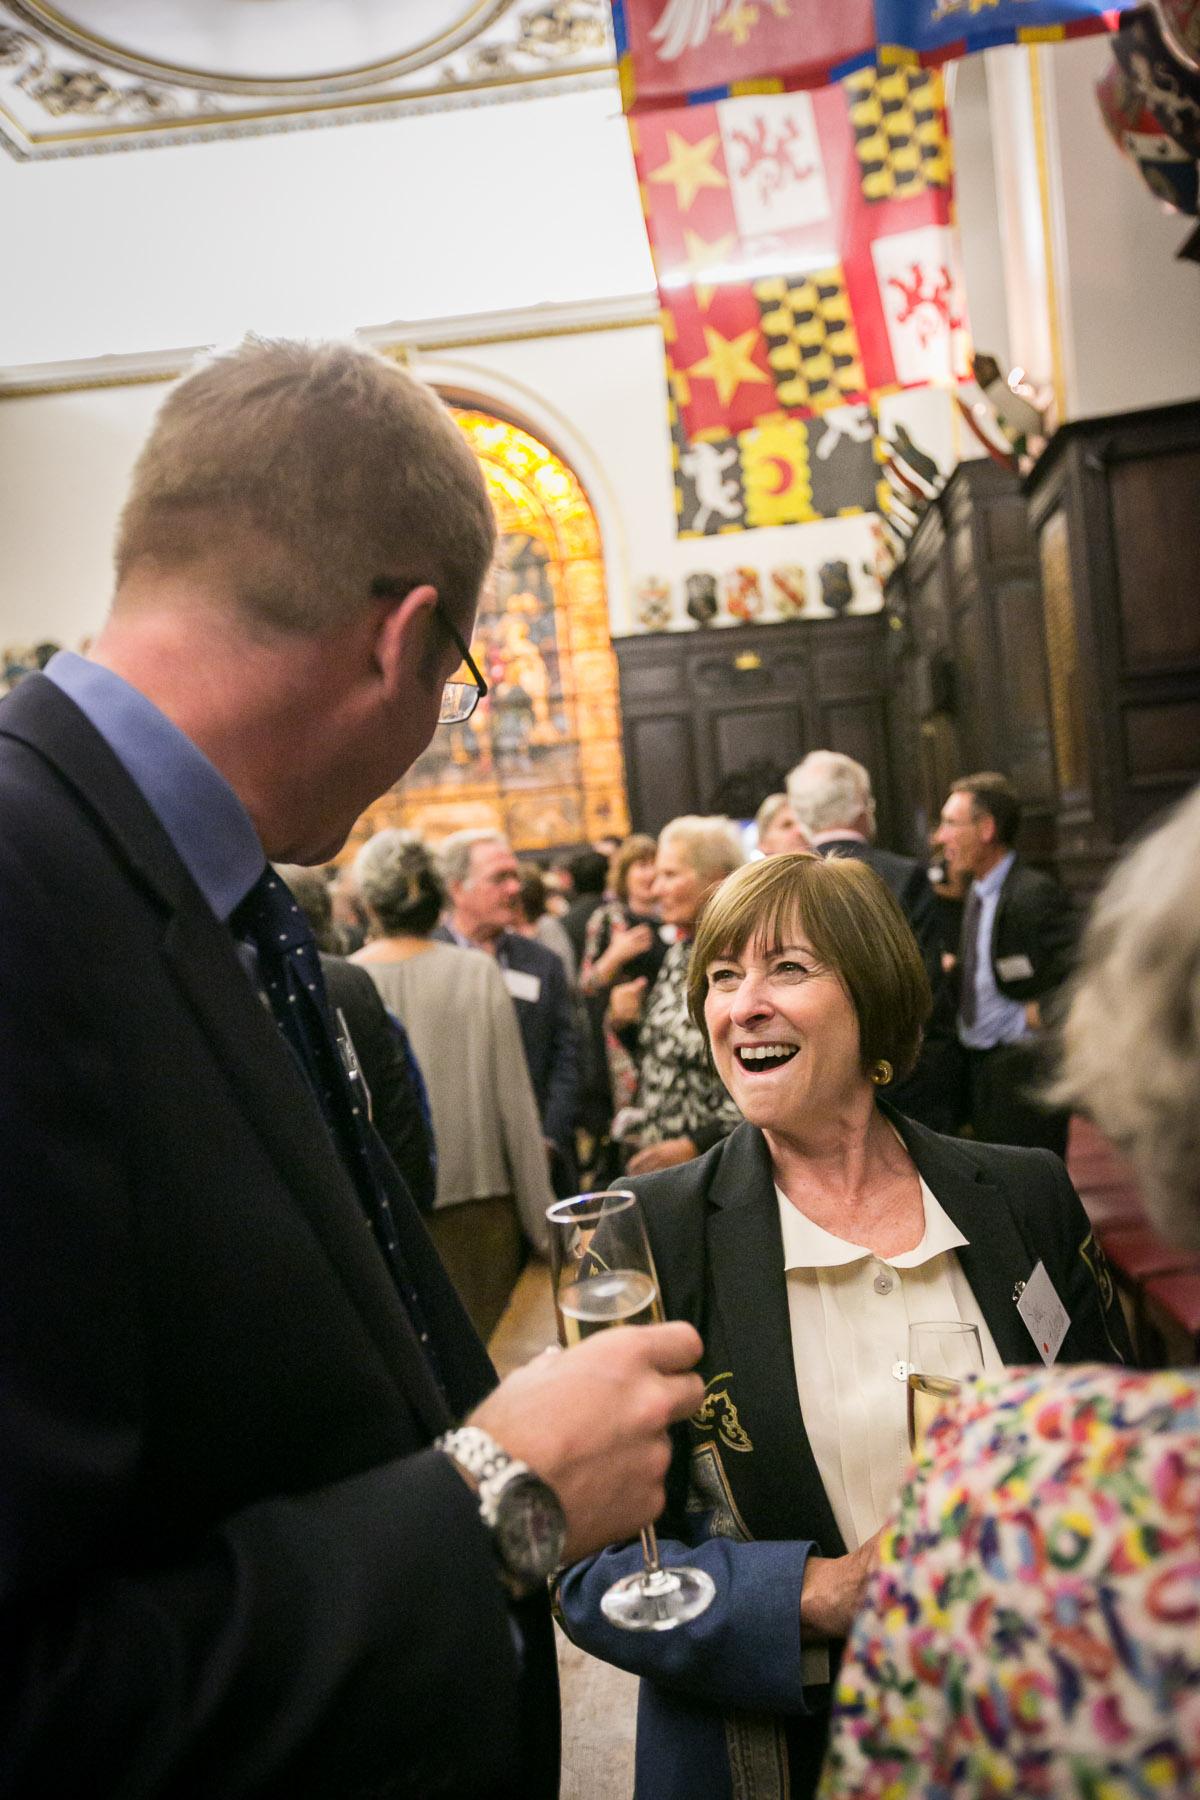 Jon Wood, Sue Fletcher